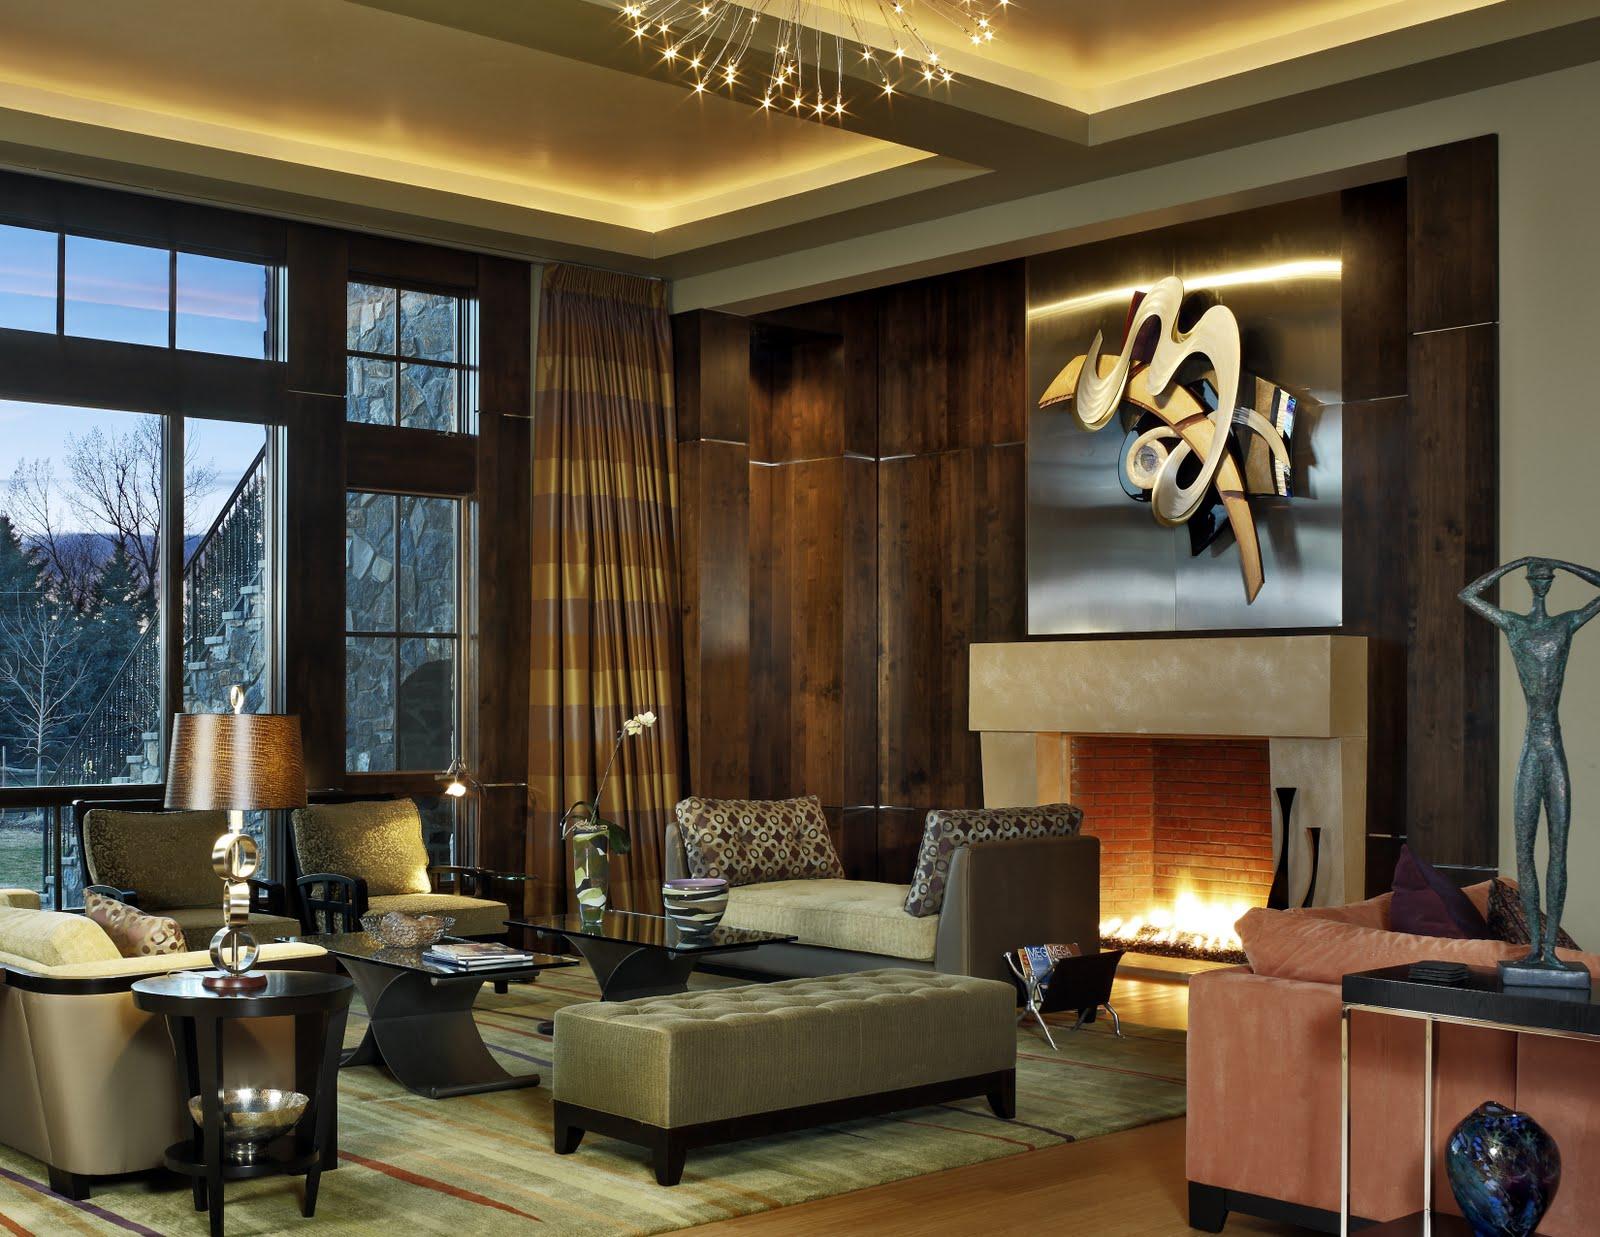 Modern Stone Fireplace Designs: Distinctive Mantel Designs, Inc.: Best New Contemporary